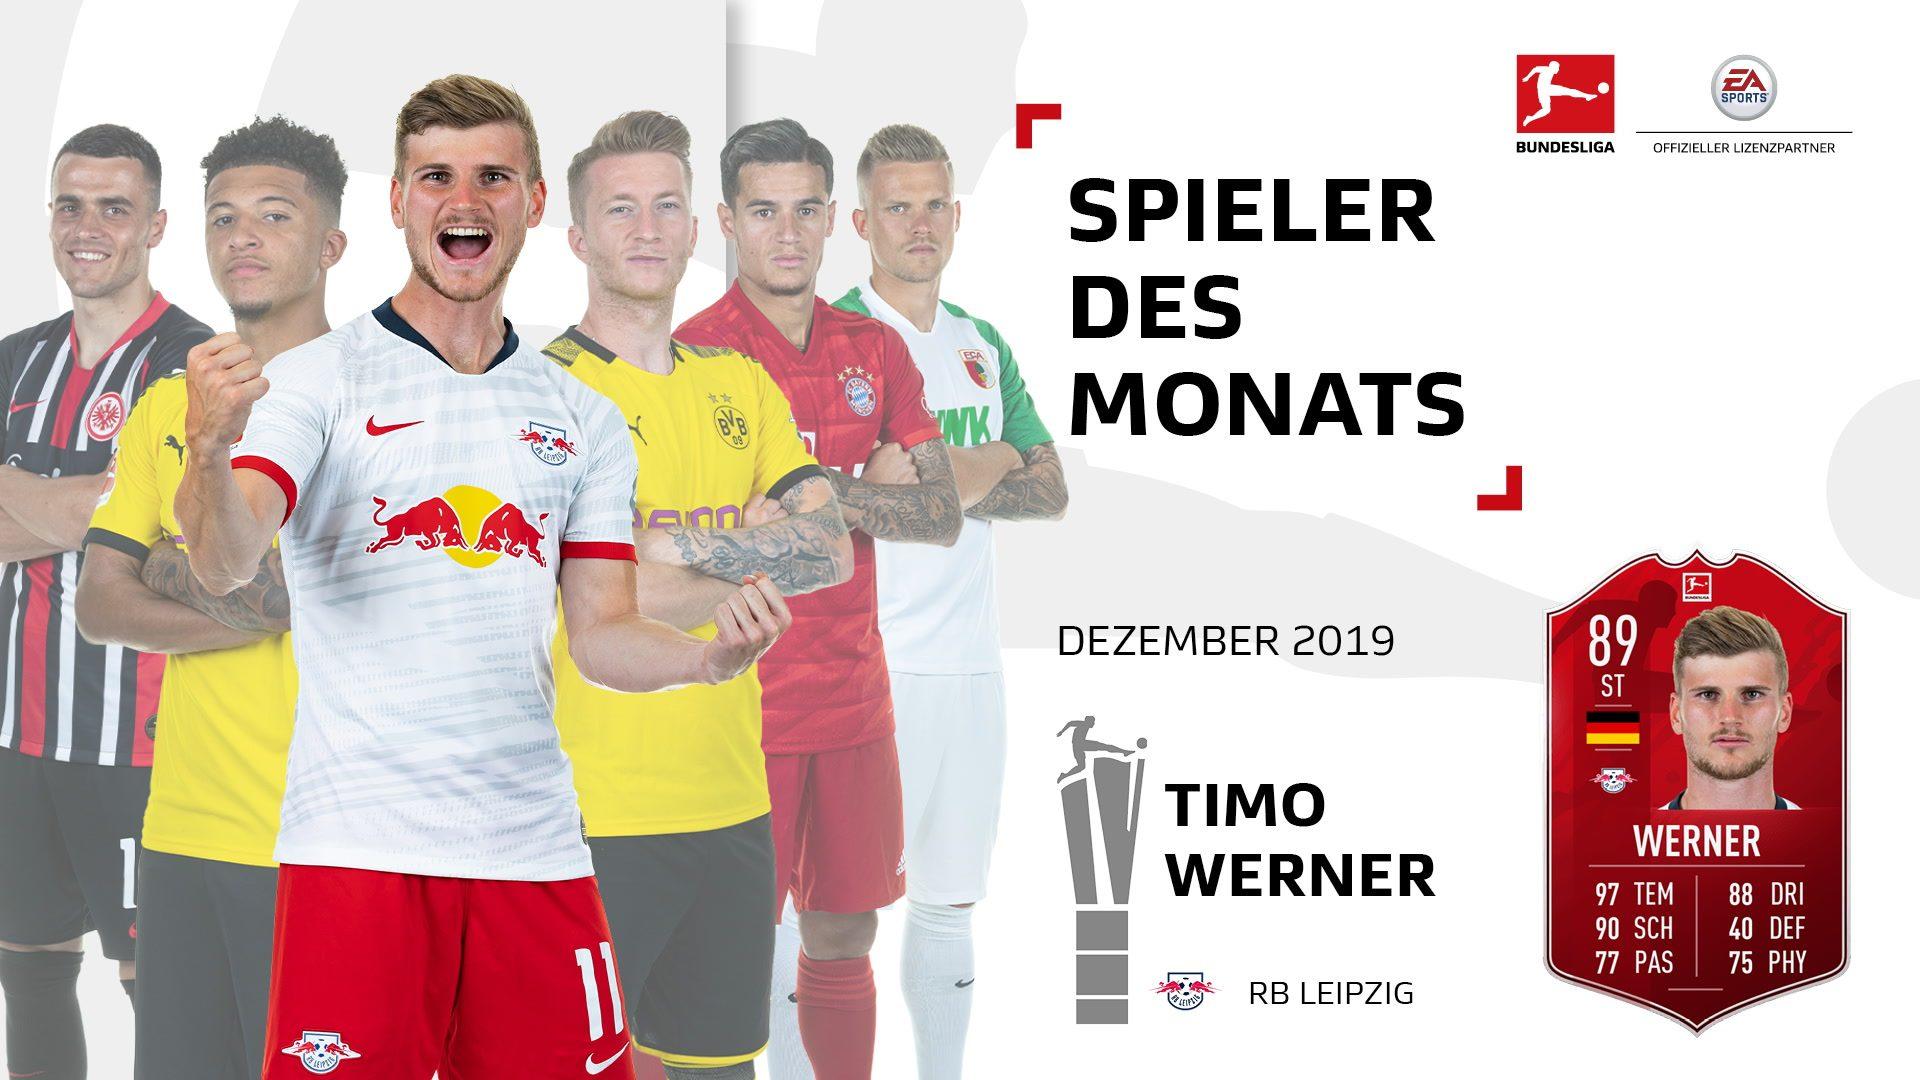 Timo Werner ist der Spieler des Monats Dezember